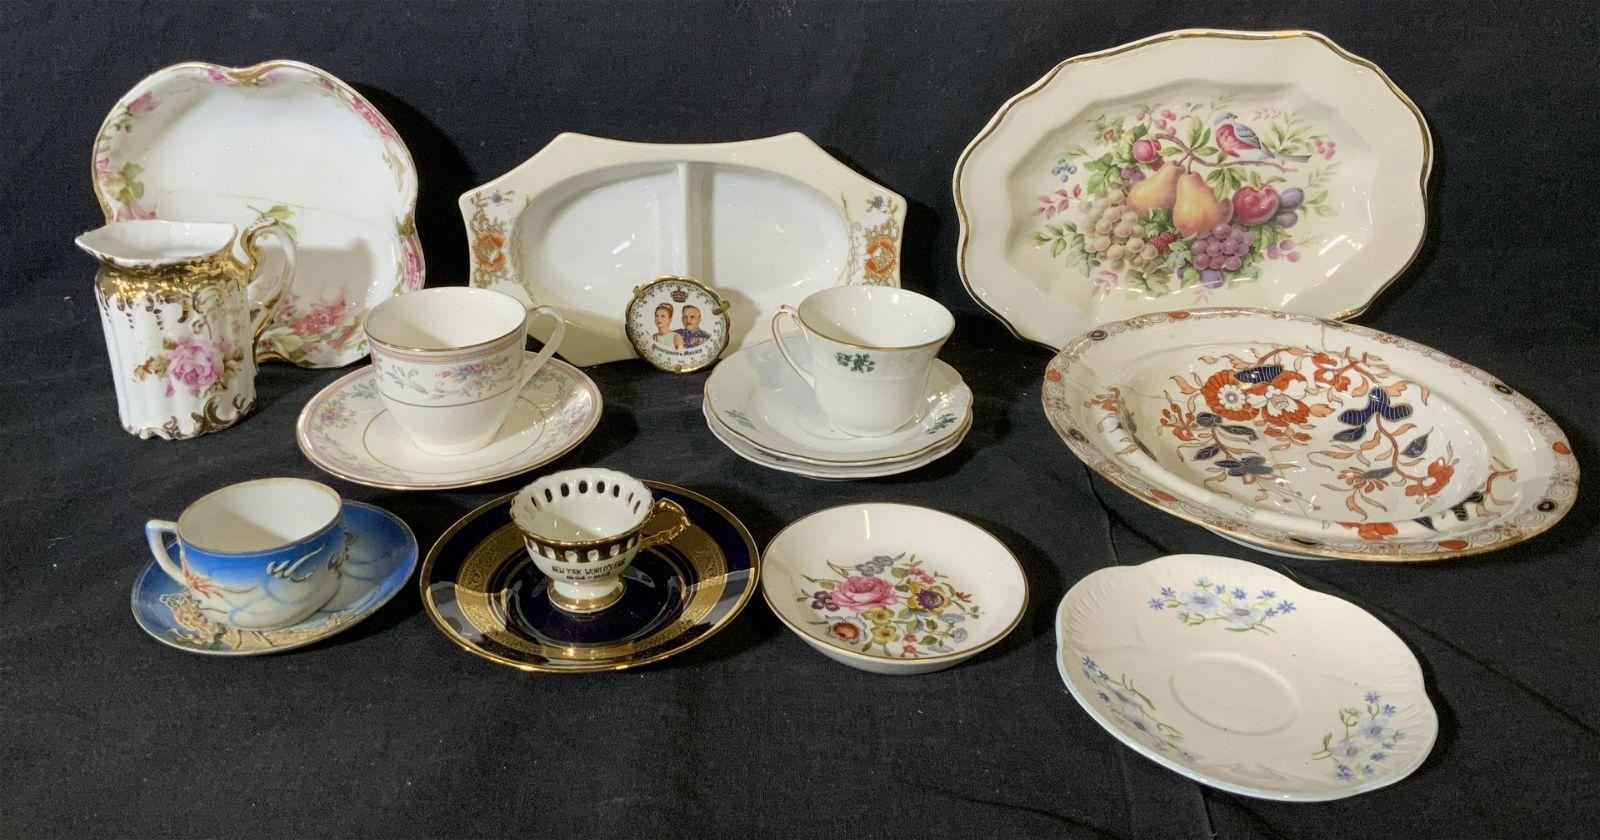 Group Lot 17 Miscellaneous Porcelain Objects